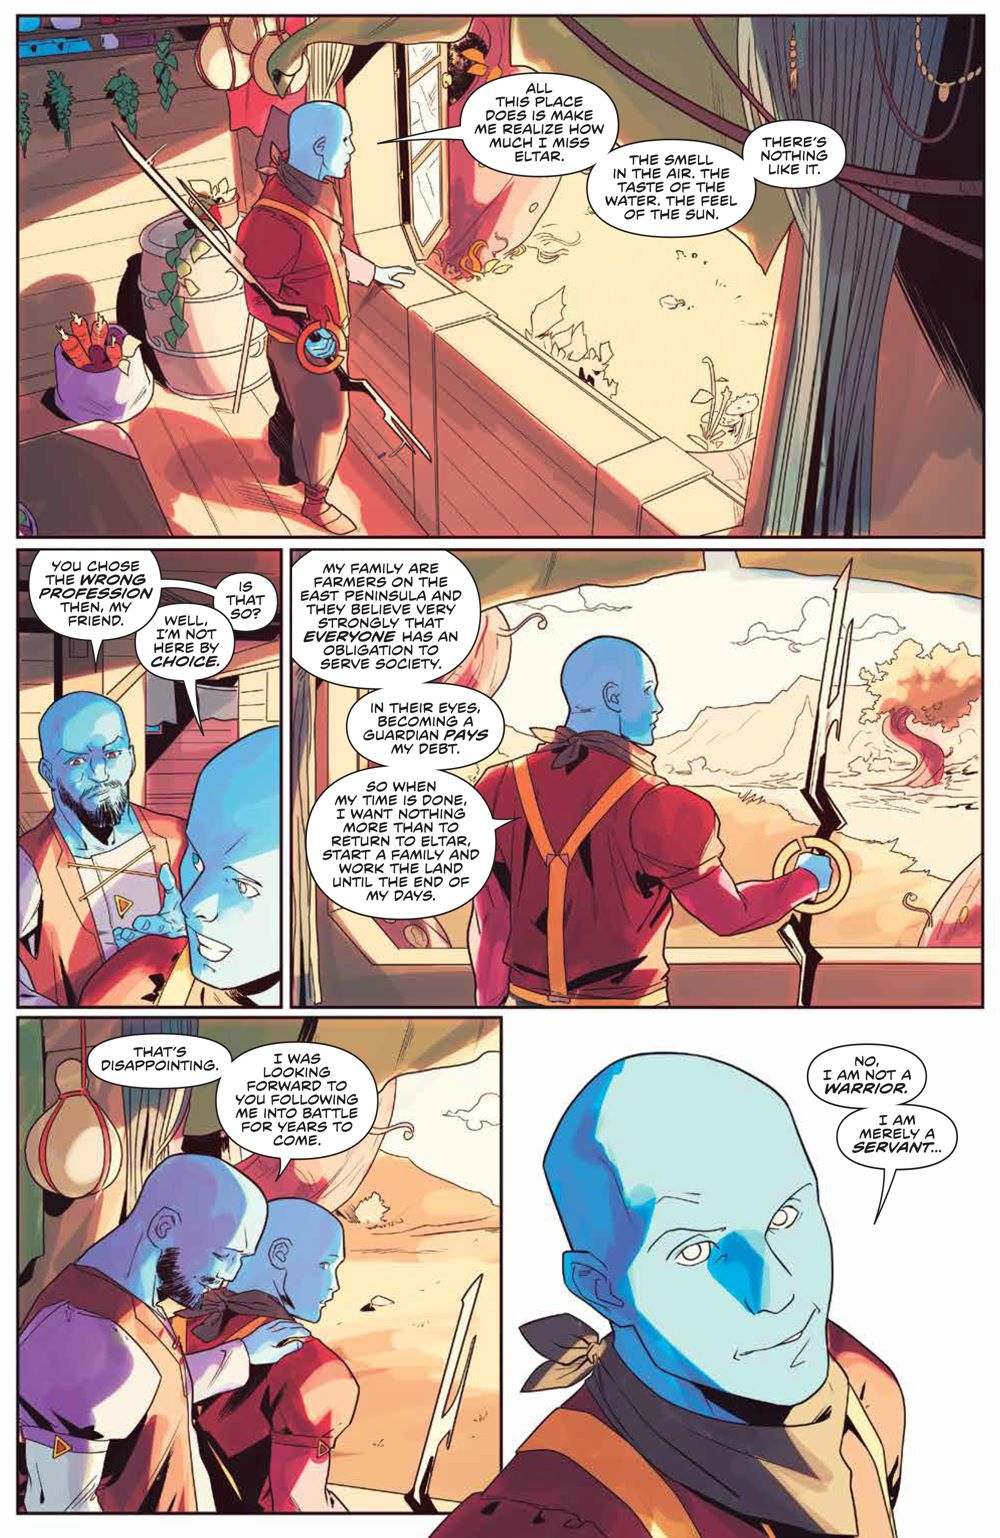 MightyMorphin_003_PRESS_5 ComicList Previews: MIGHTY MORPHIN #3